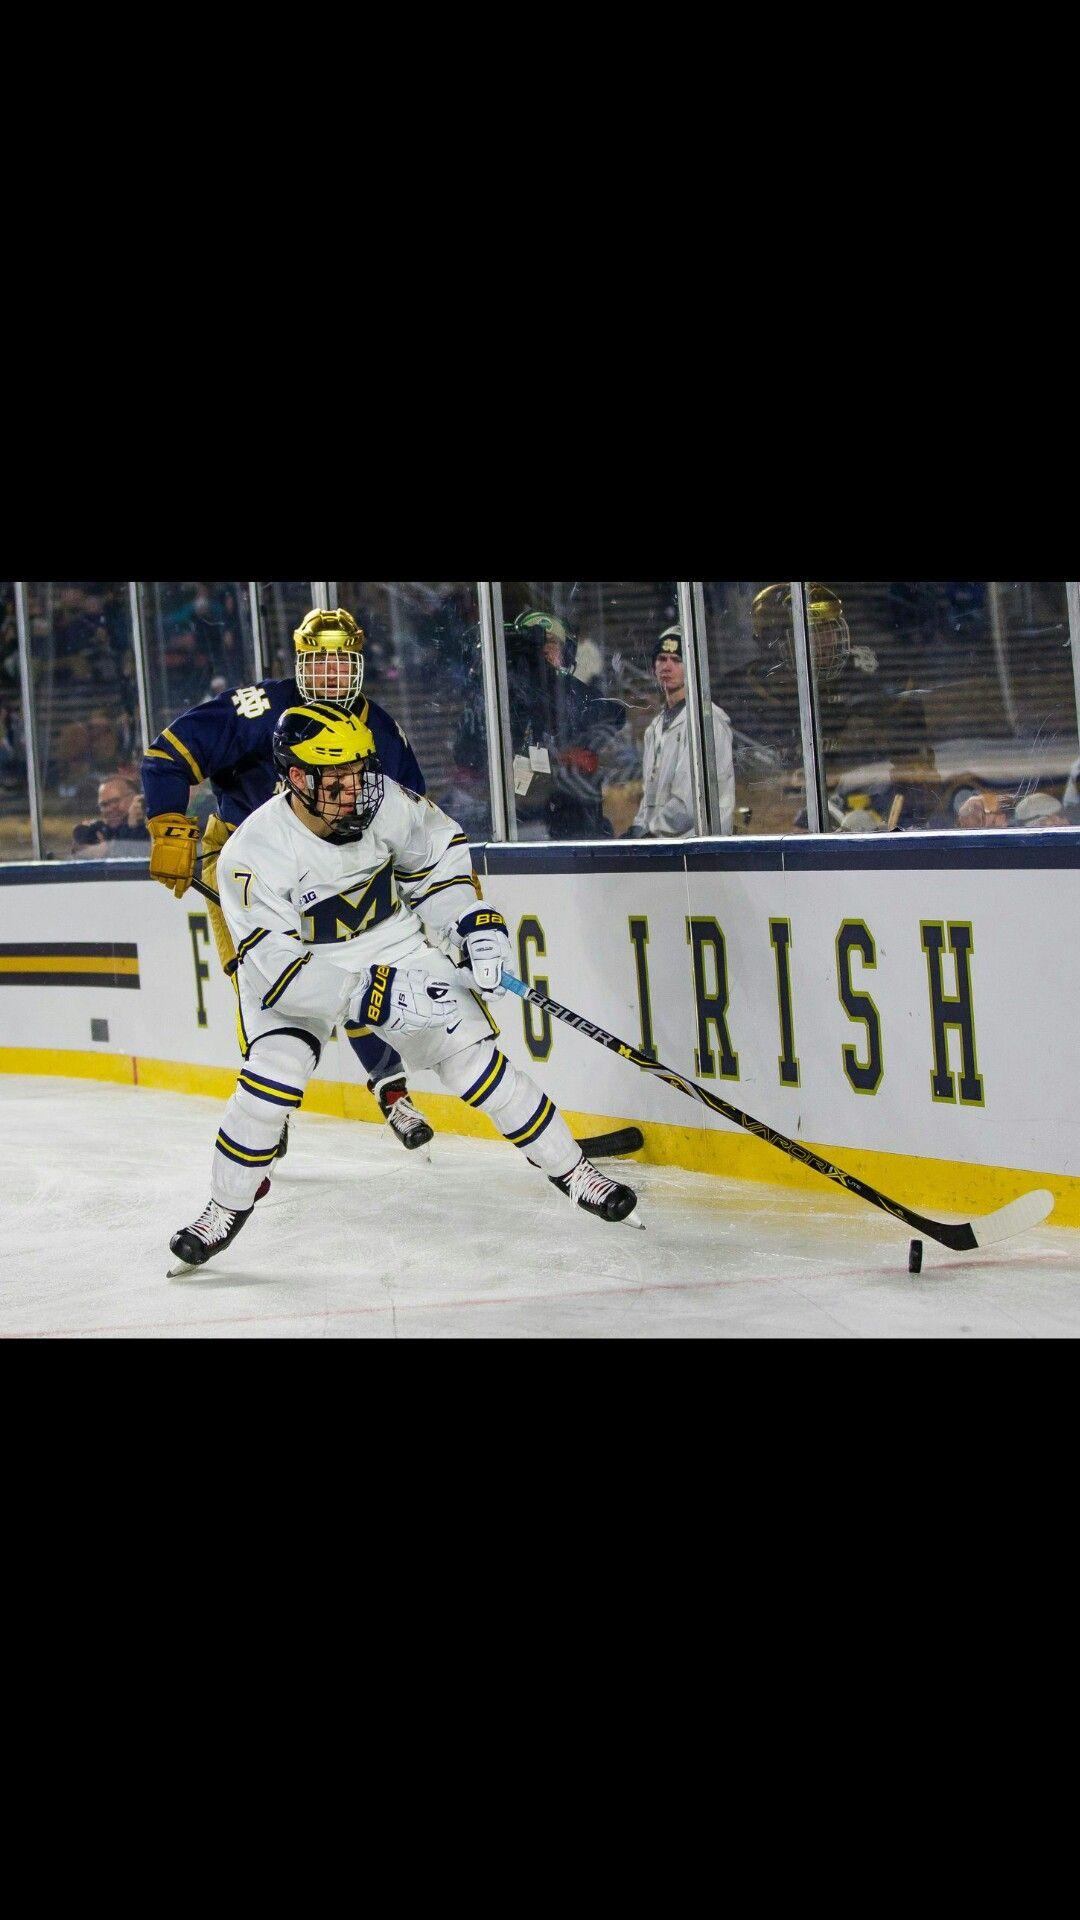 Pin by Eric on Michigan Hockey Michigan hockey, College